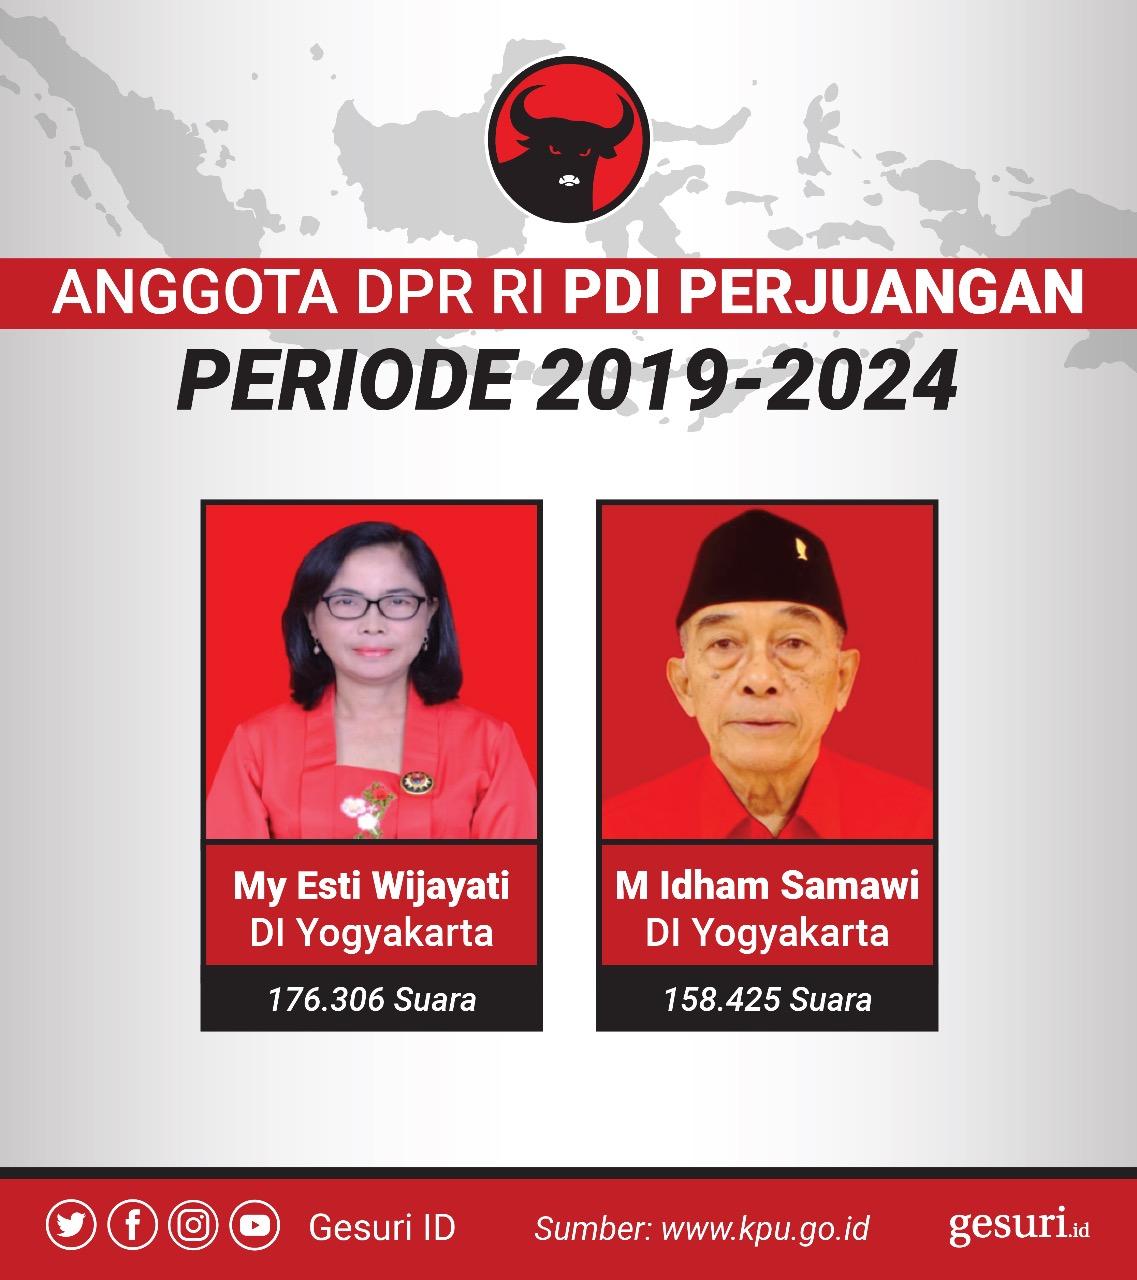 Anggota DPR RI 2019 - 2024 Dapil DI Yogyakarta